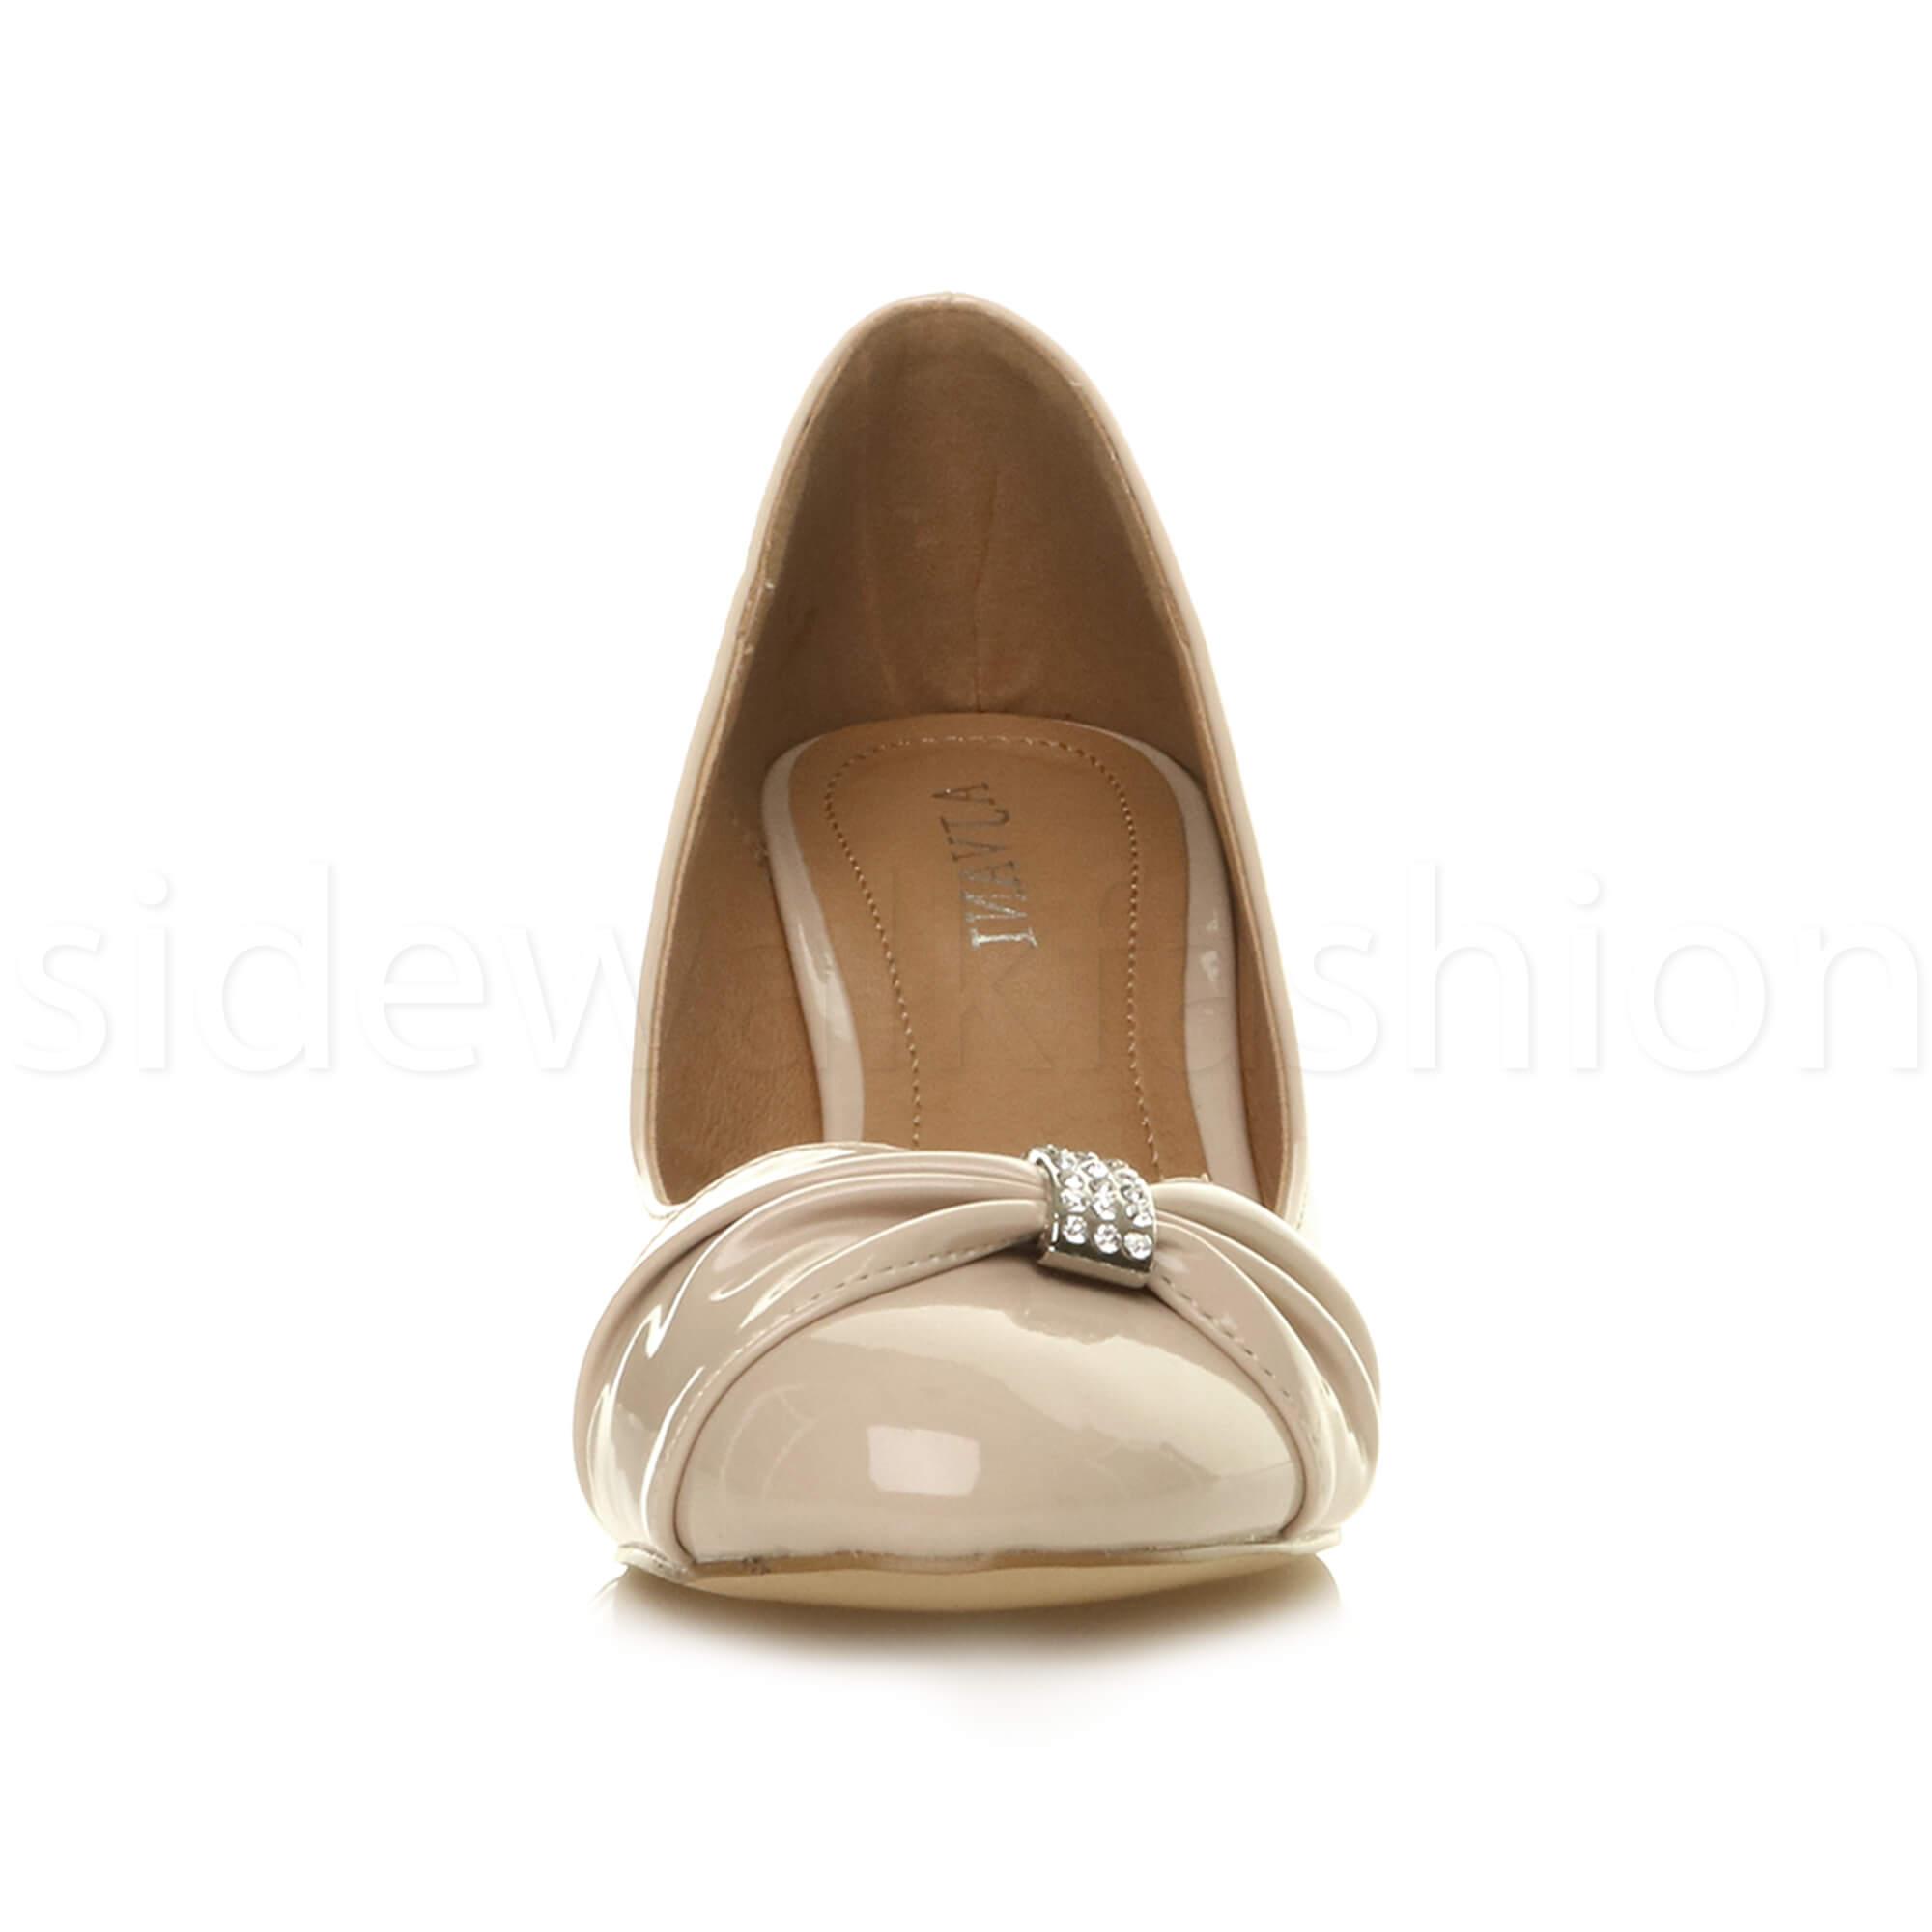 Womens-ladies-low-mid-heel-diamante-party-smart-evening-court-shoes-size thumbnail 71